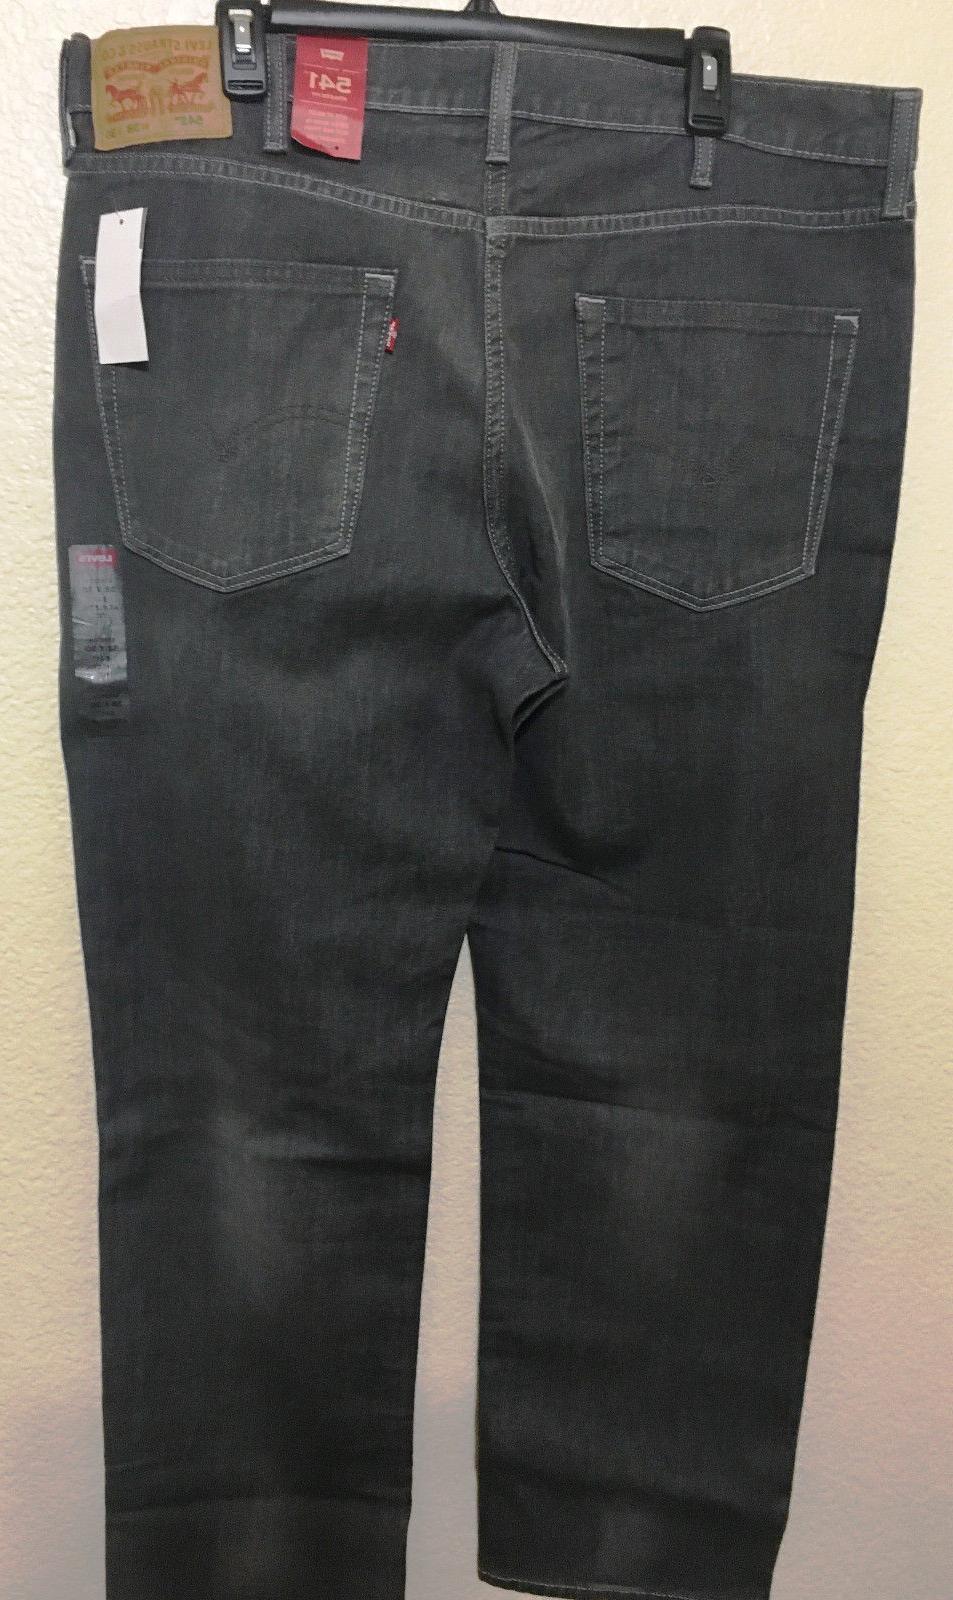 NWT MEN - 0021 STRAIGHT LEG JEANS DENIM CHARCOAL